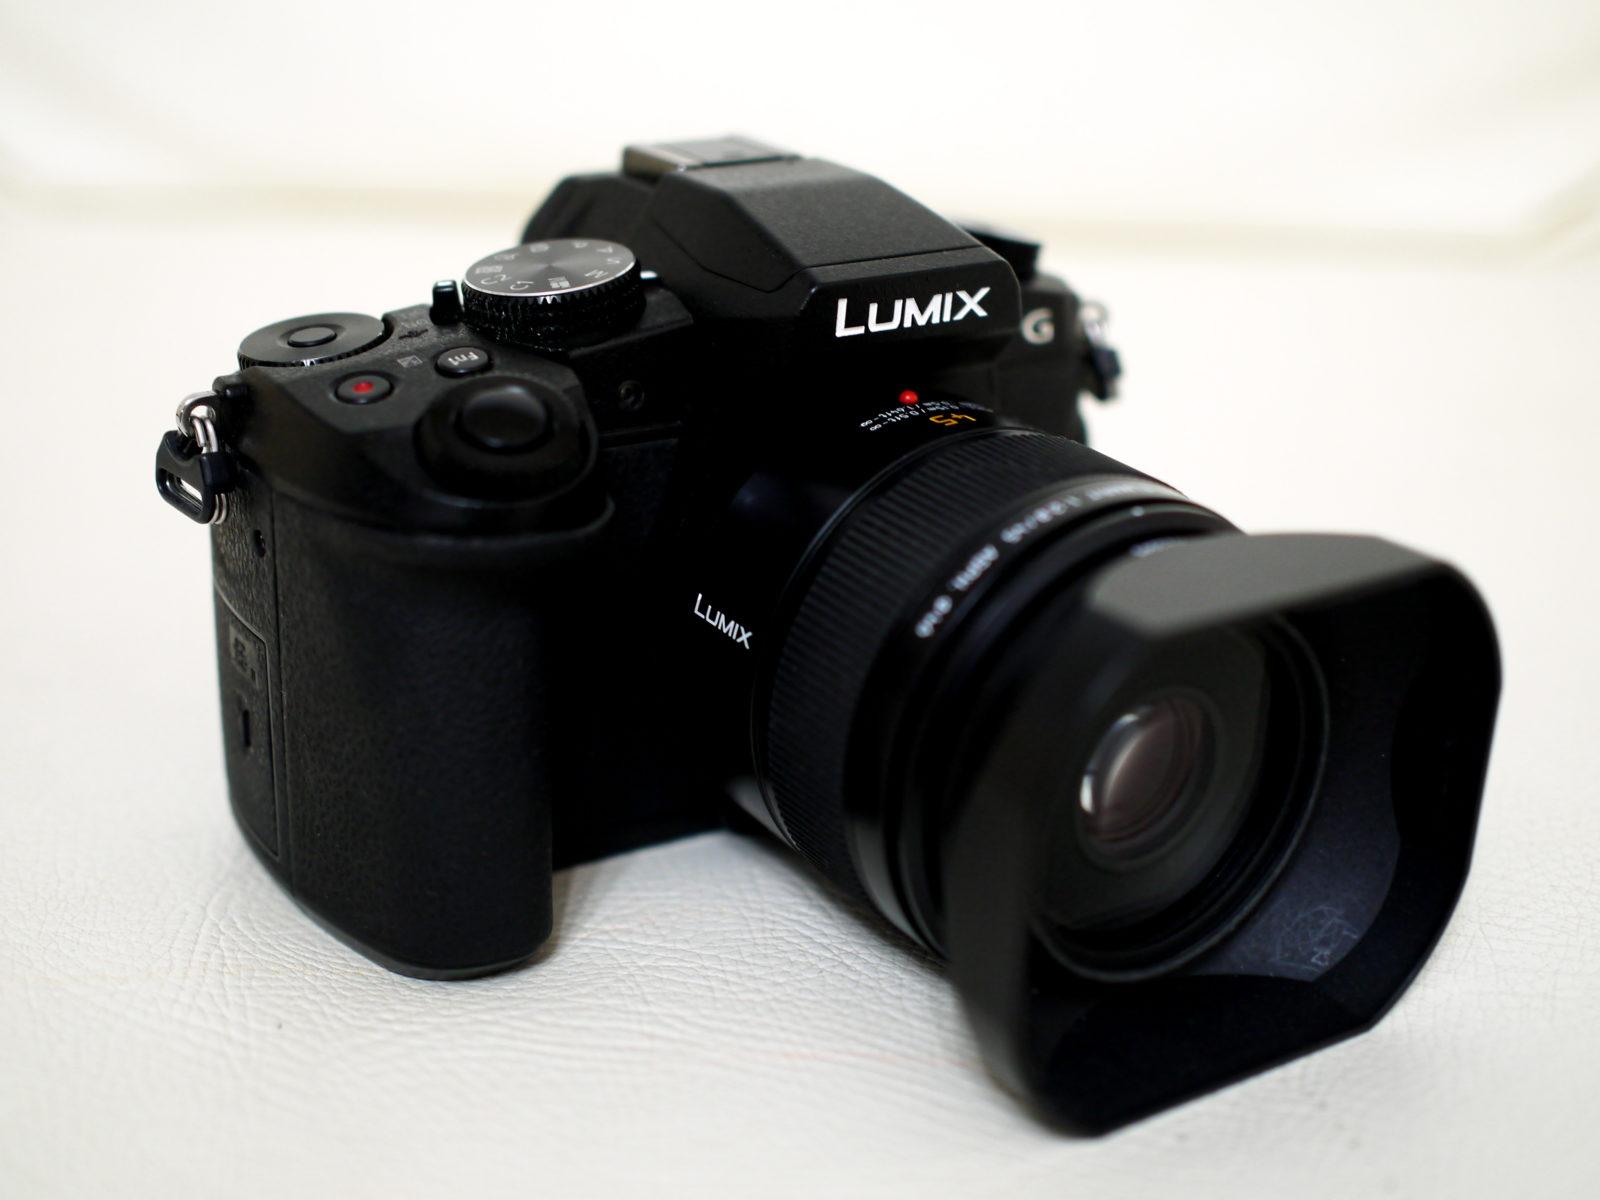 LUMIX G8 + LEICA MACRO 45mm